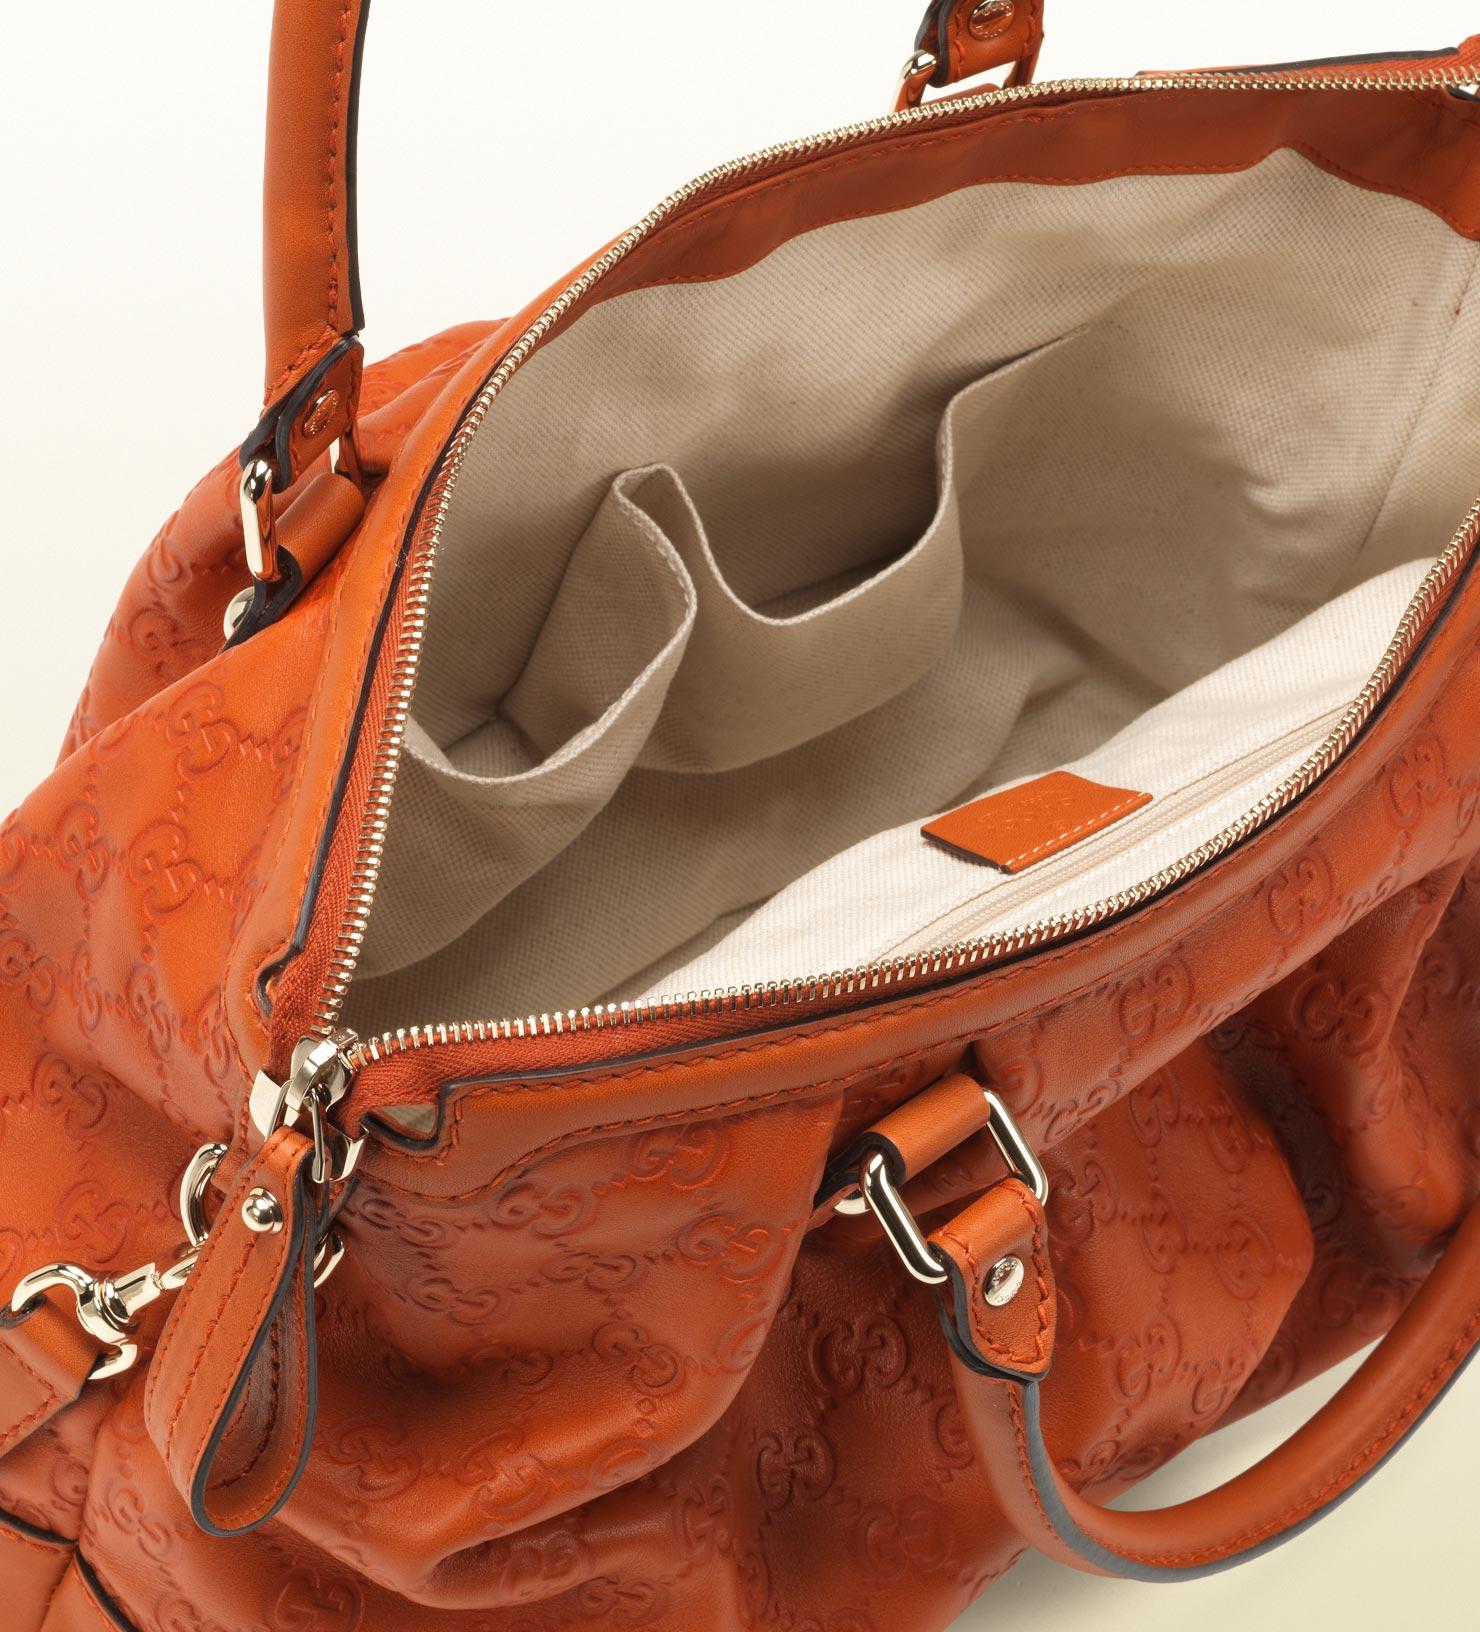 c031d2f2d4ca Gucci Sukey Guccissima Leather Top Handle Bag in Orange - Lyst